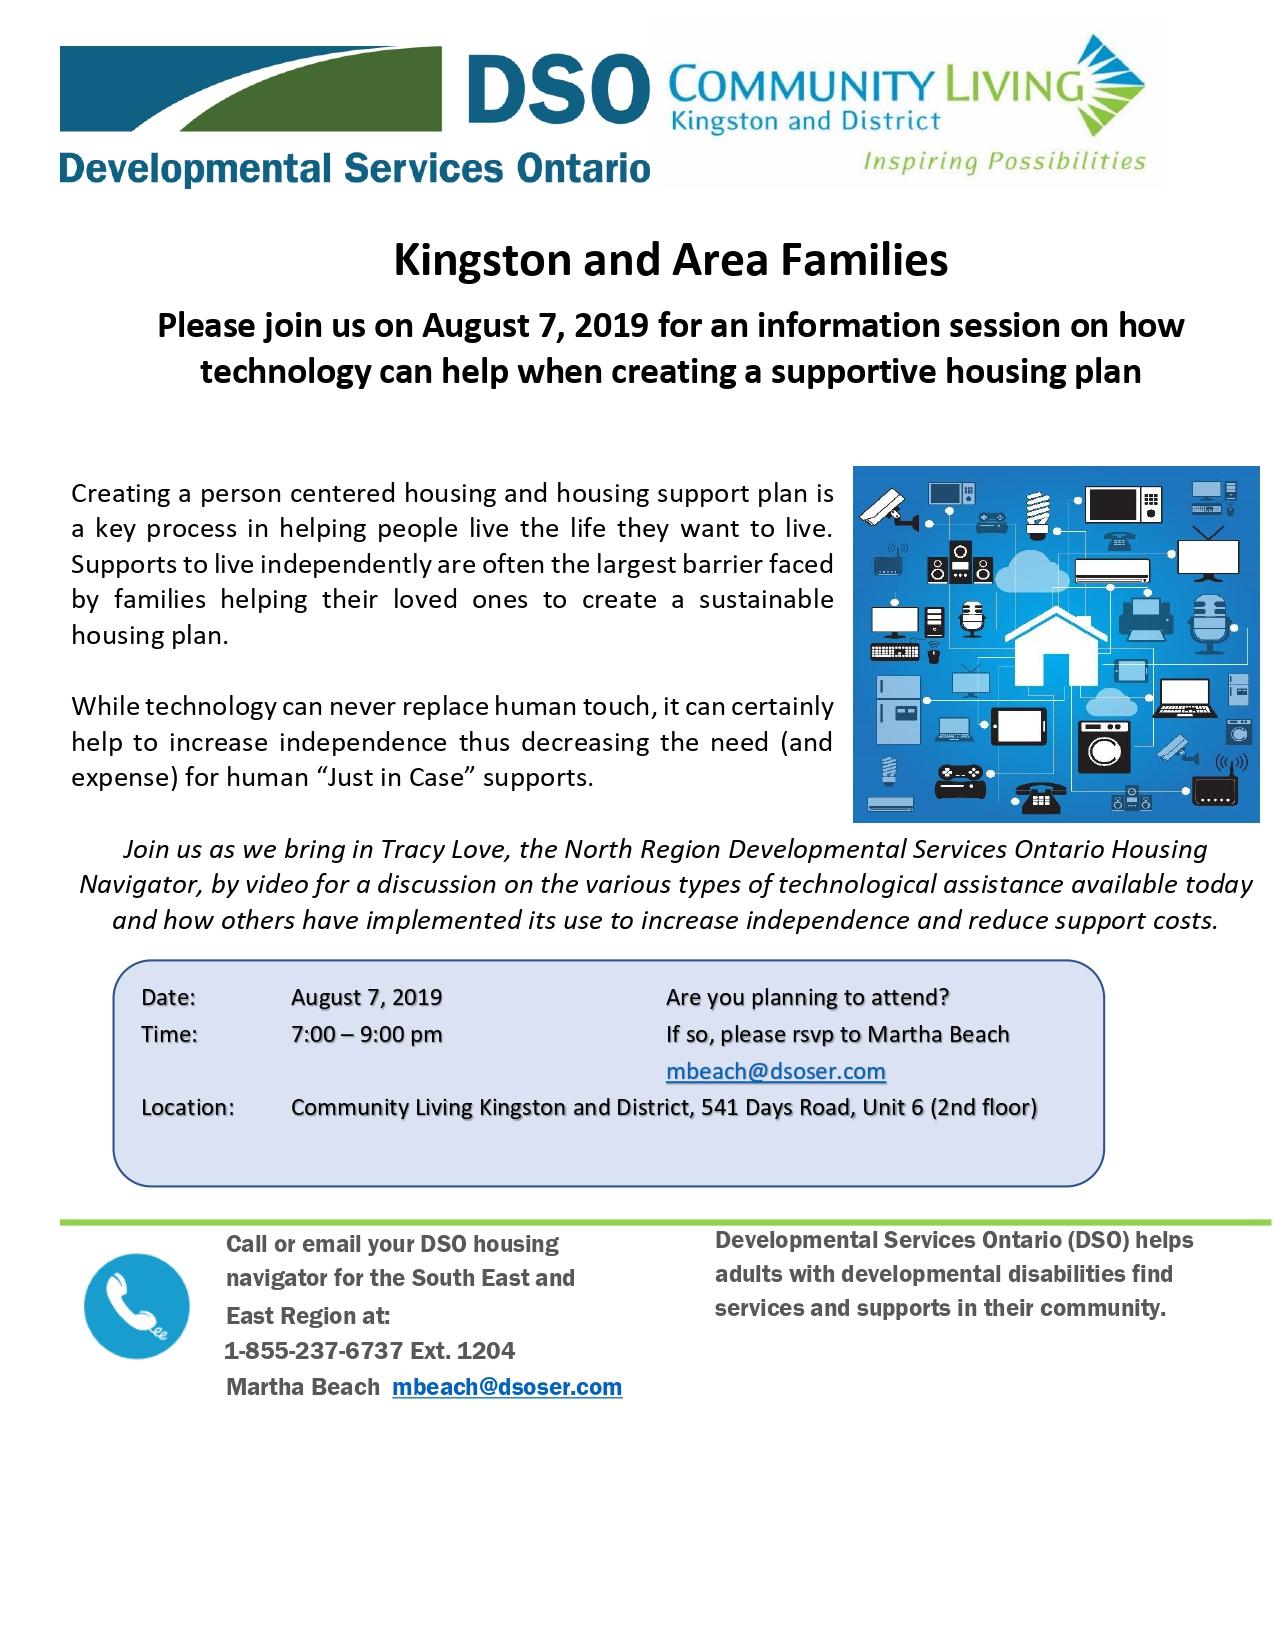 Housing Coordinator Flyer - Kingston - August 7 2019.jpg